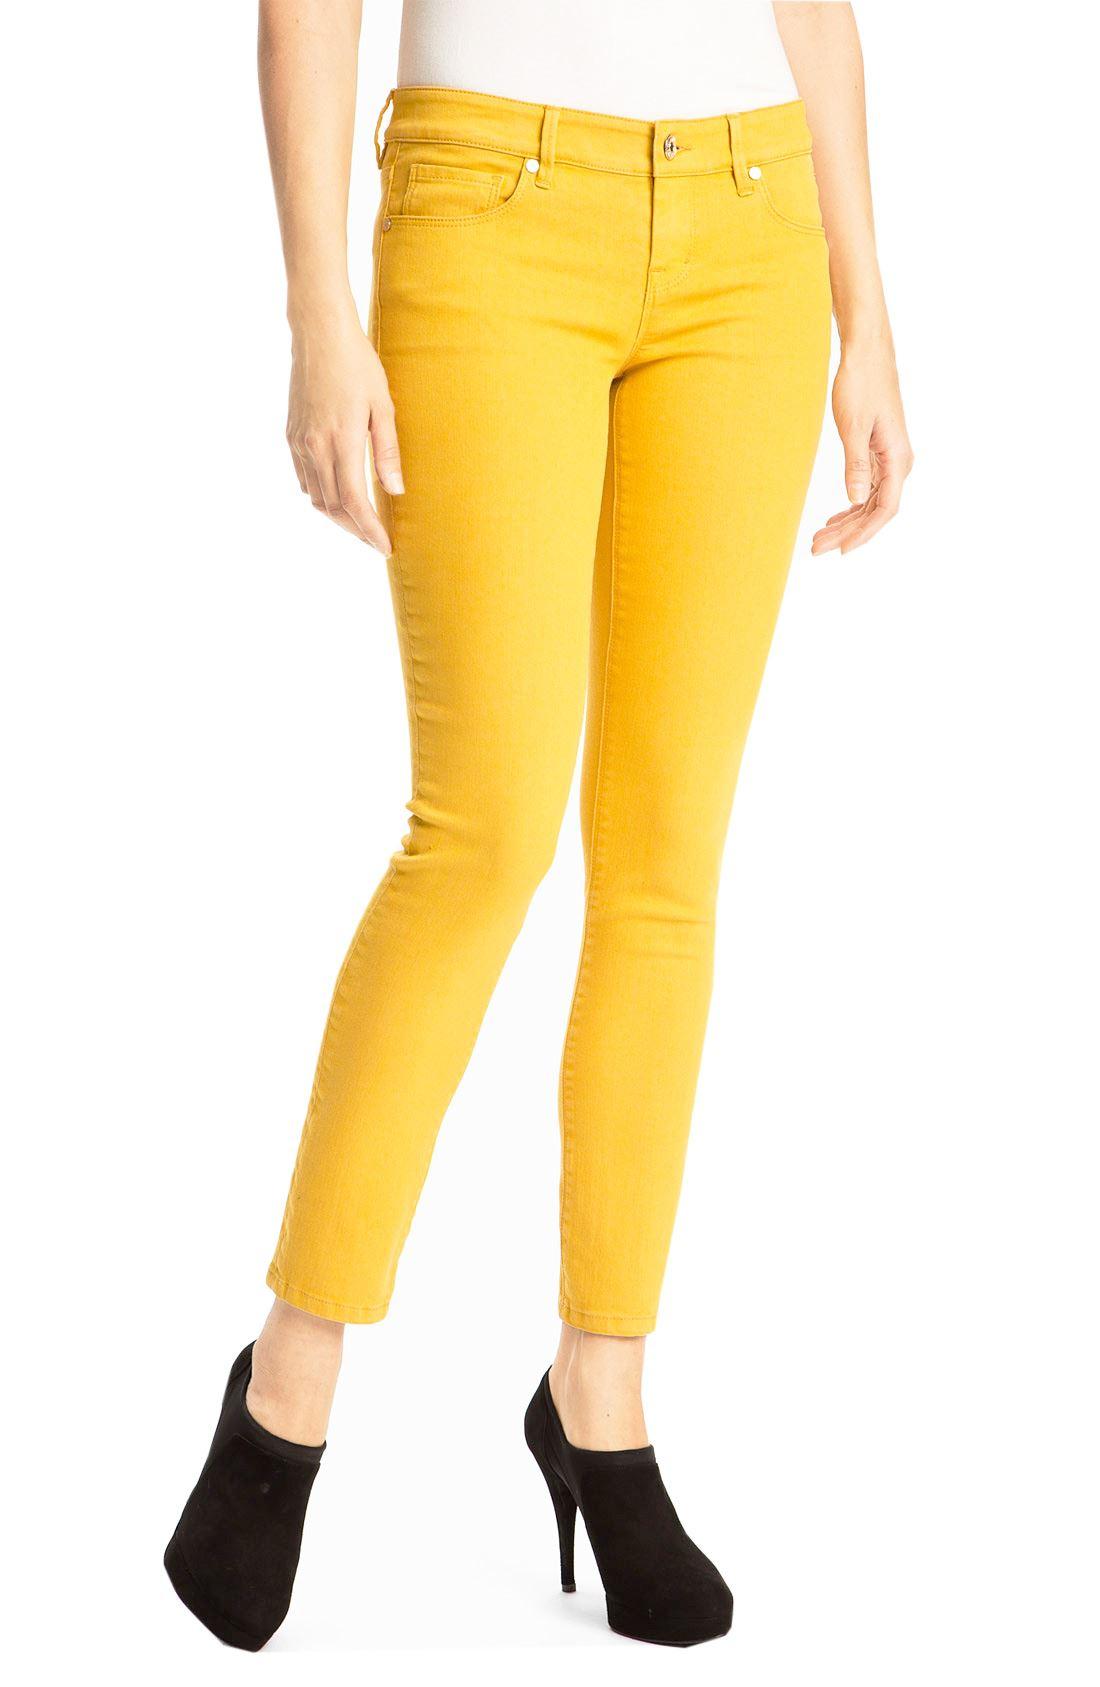 Zara Green Skinny jeans - Green skinny jeans from Zara size 38/